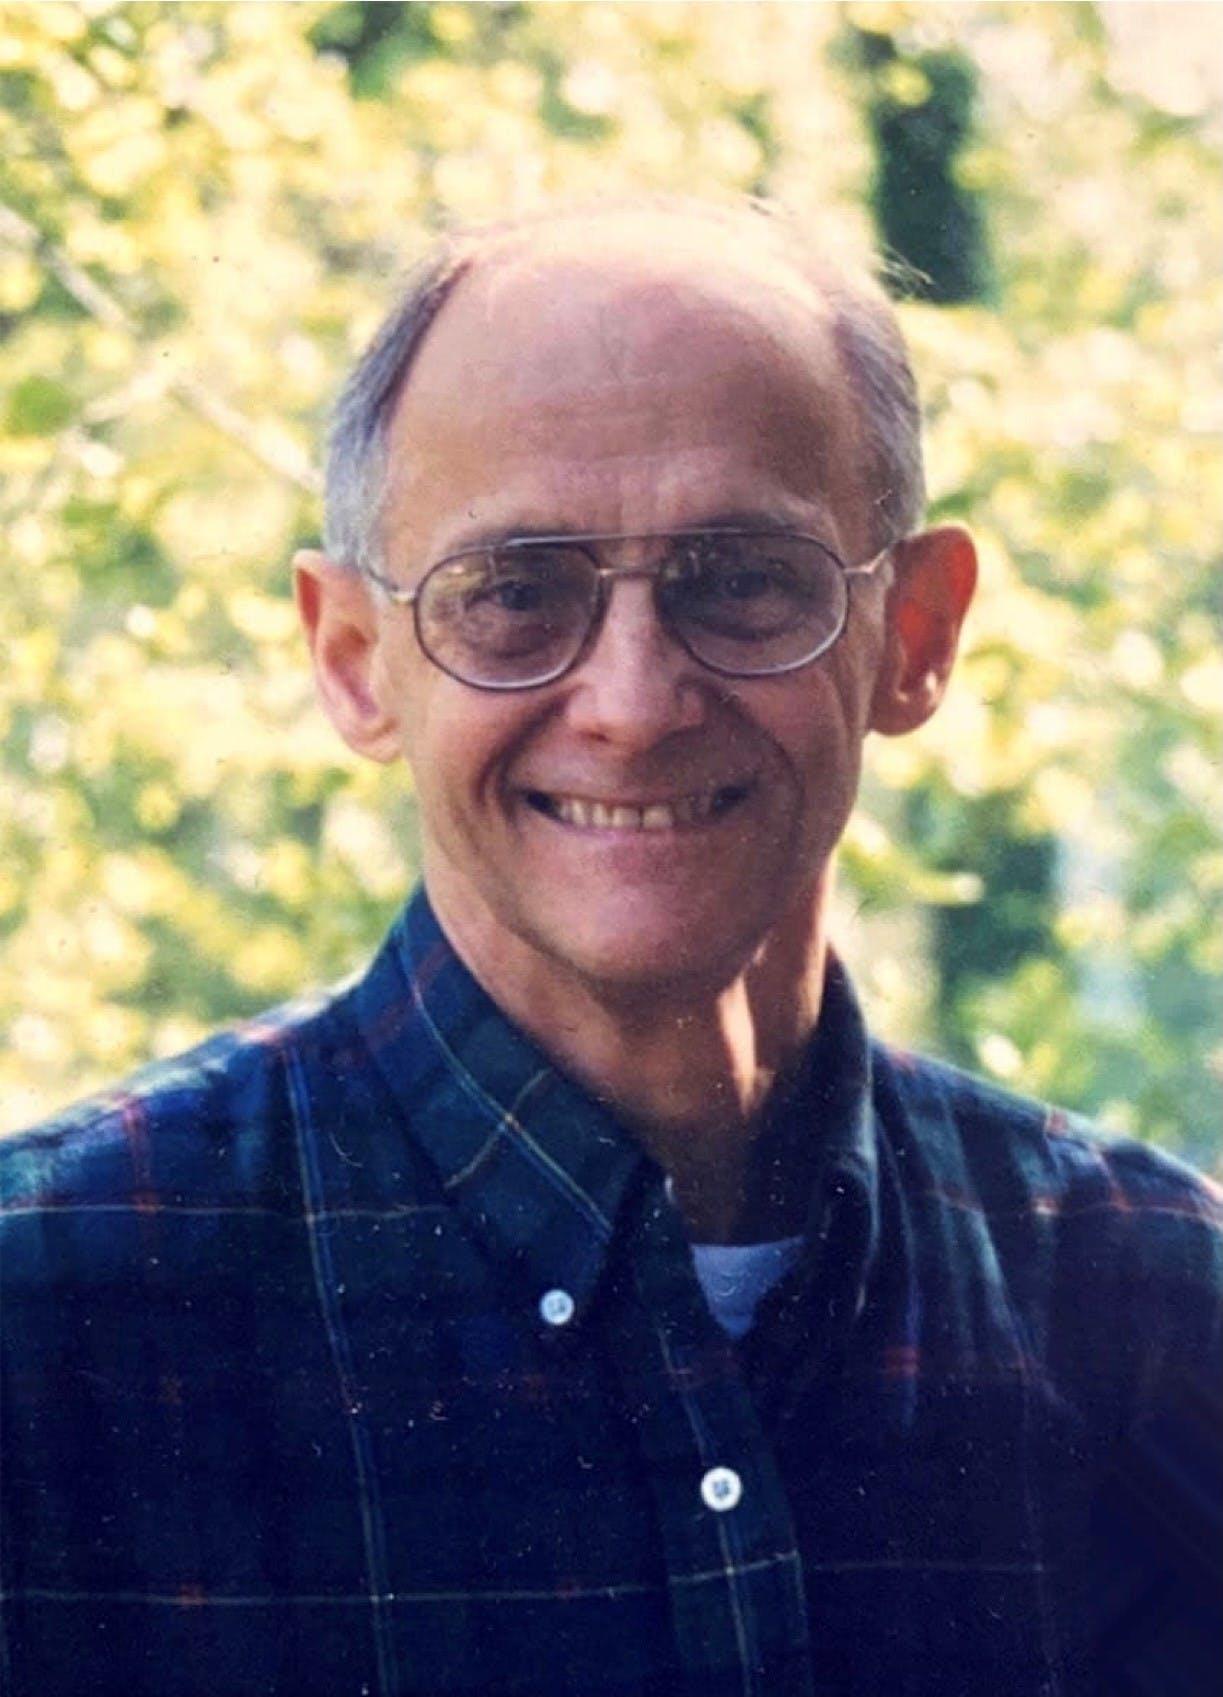 Clayton Kulp Gotwals II